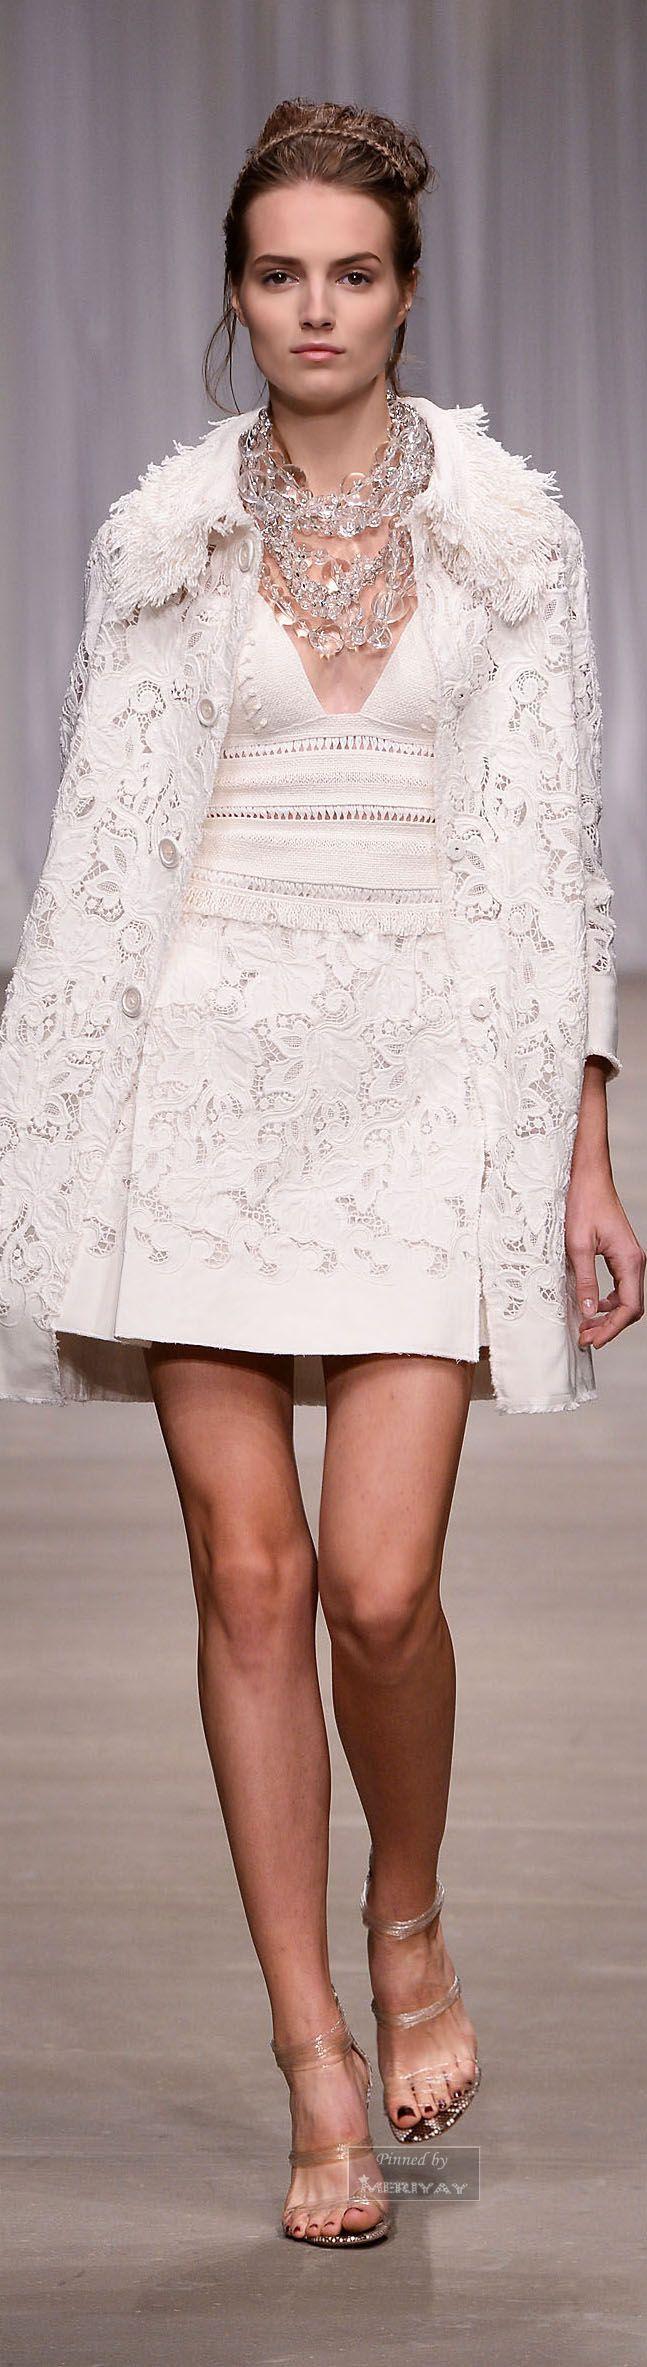 Winter/Spring Fashion| Ermanno Scervino. Spring 2015 Collection. Elegant, matching white on white eyelet appliqué short dress and coat.